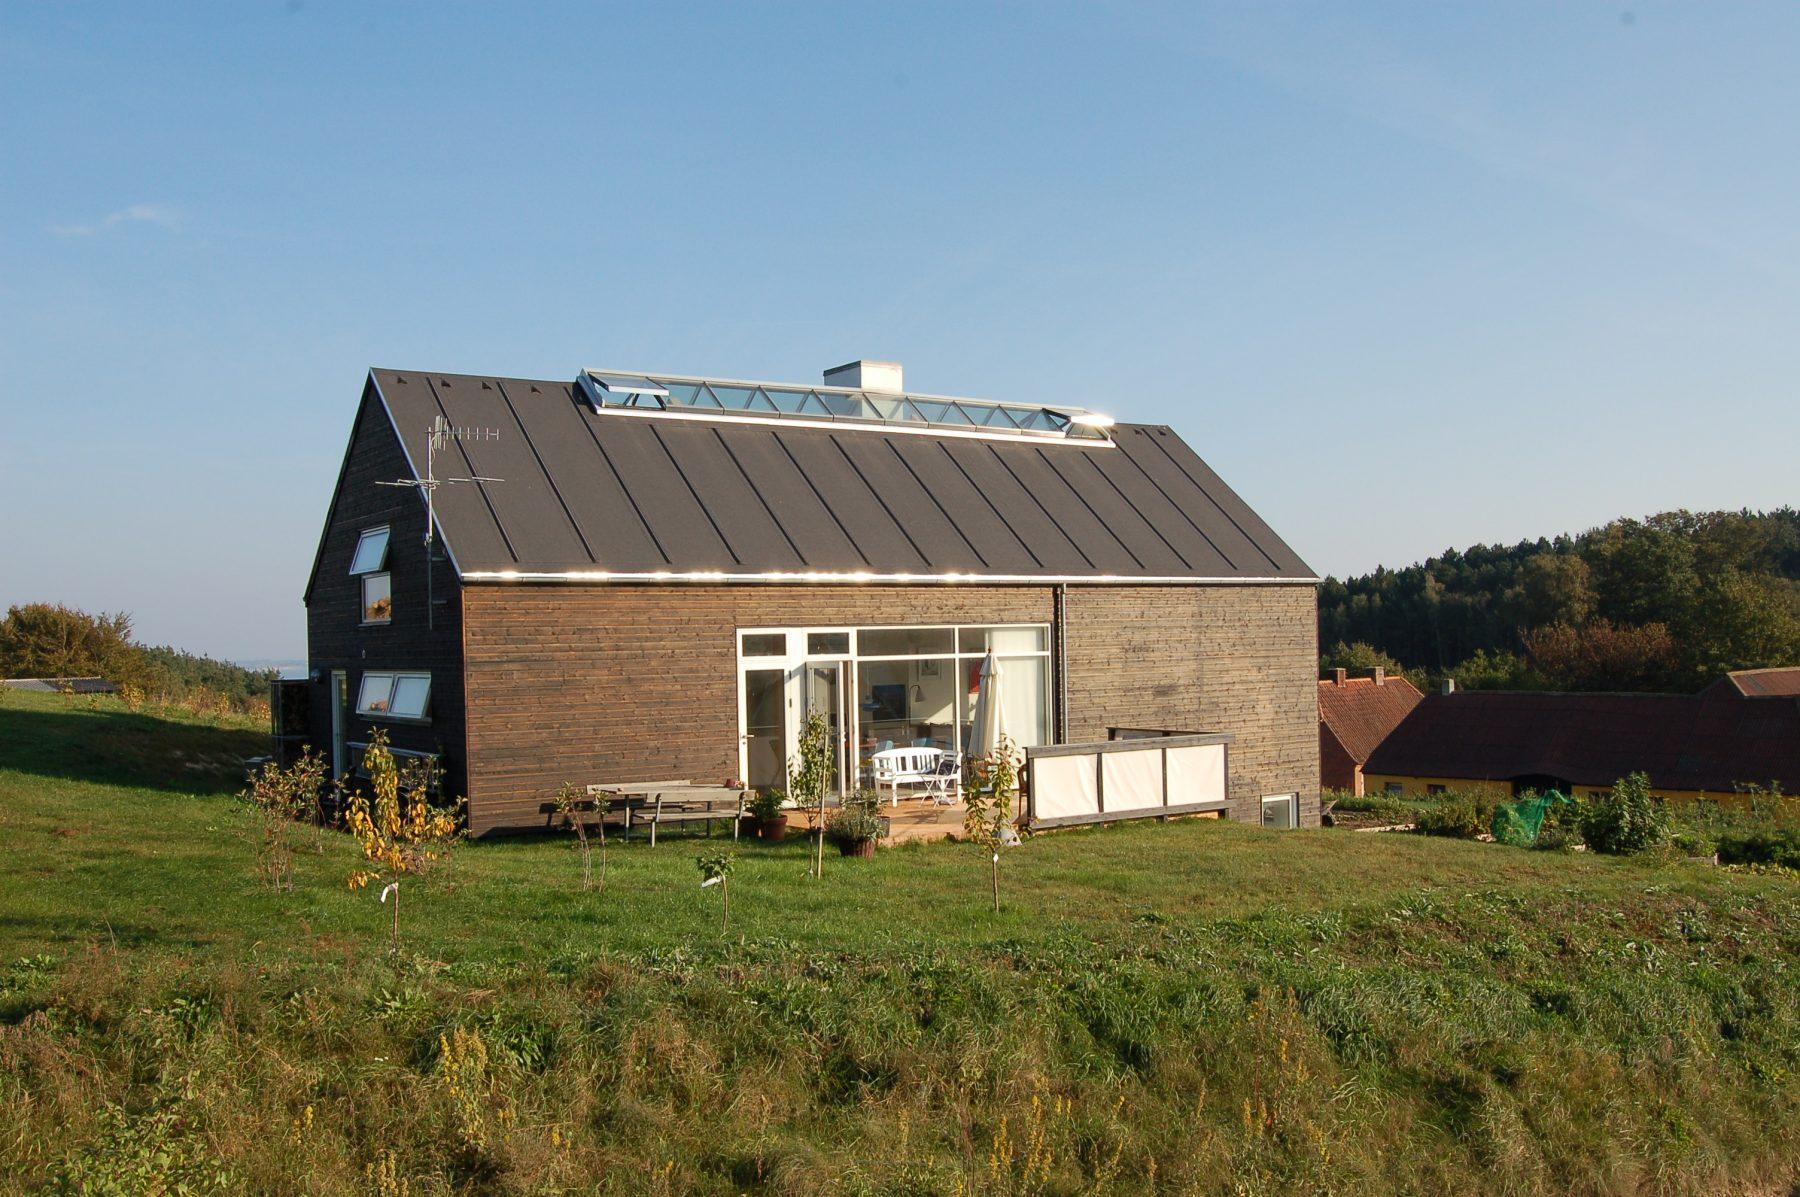 Fulgsø, Mols